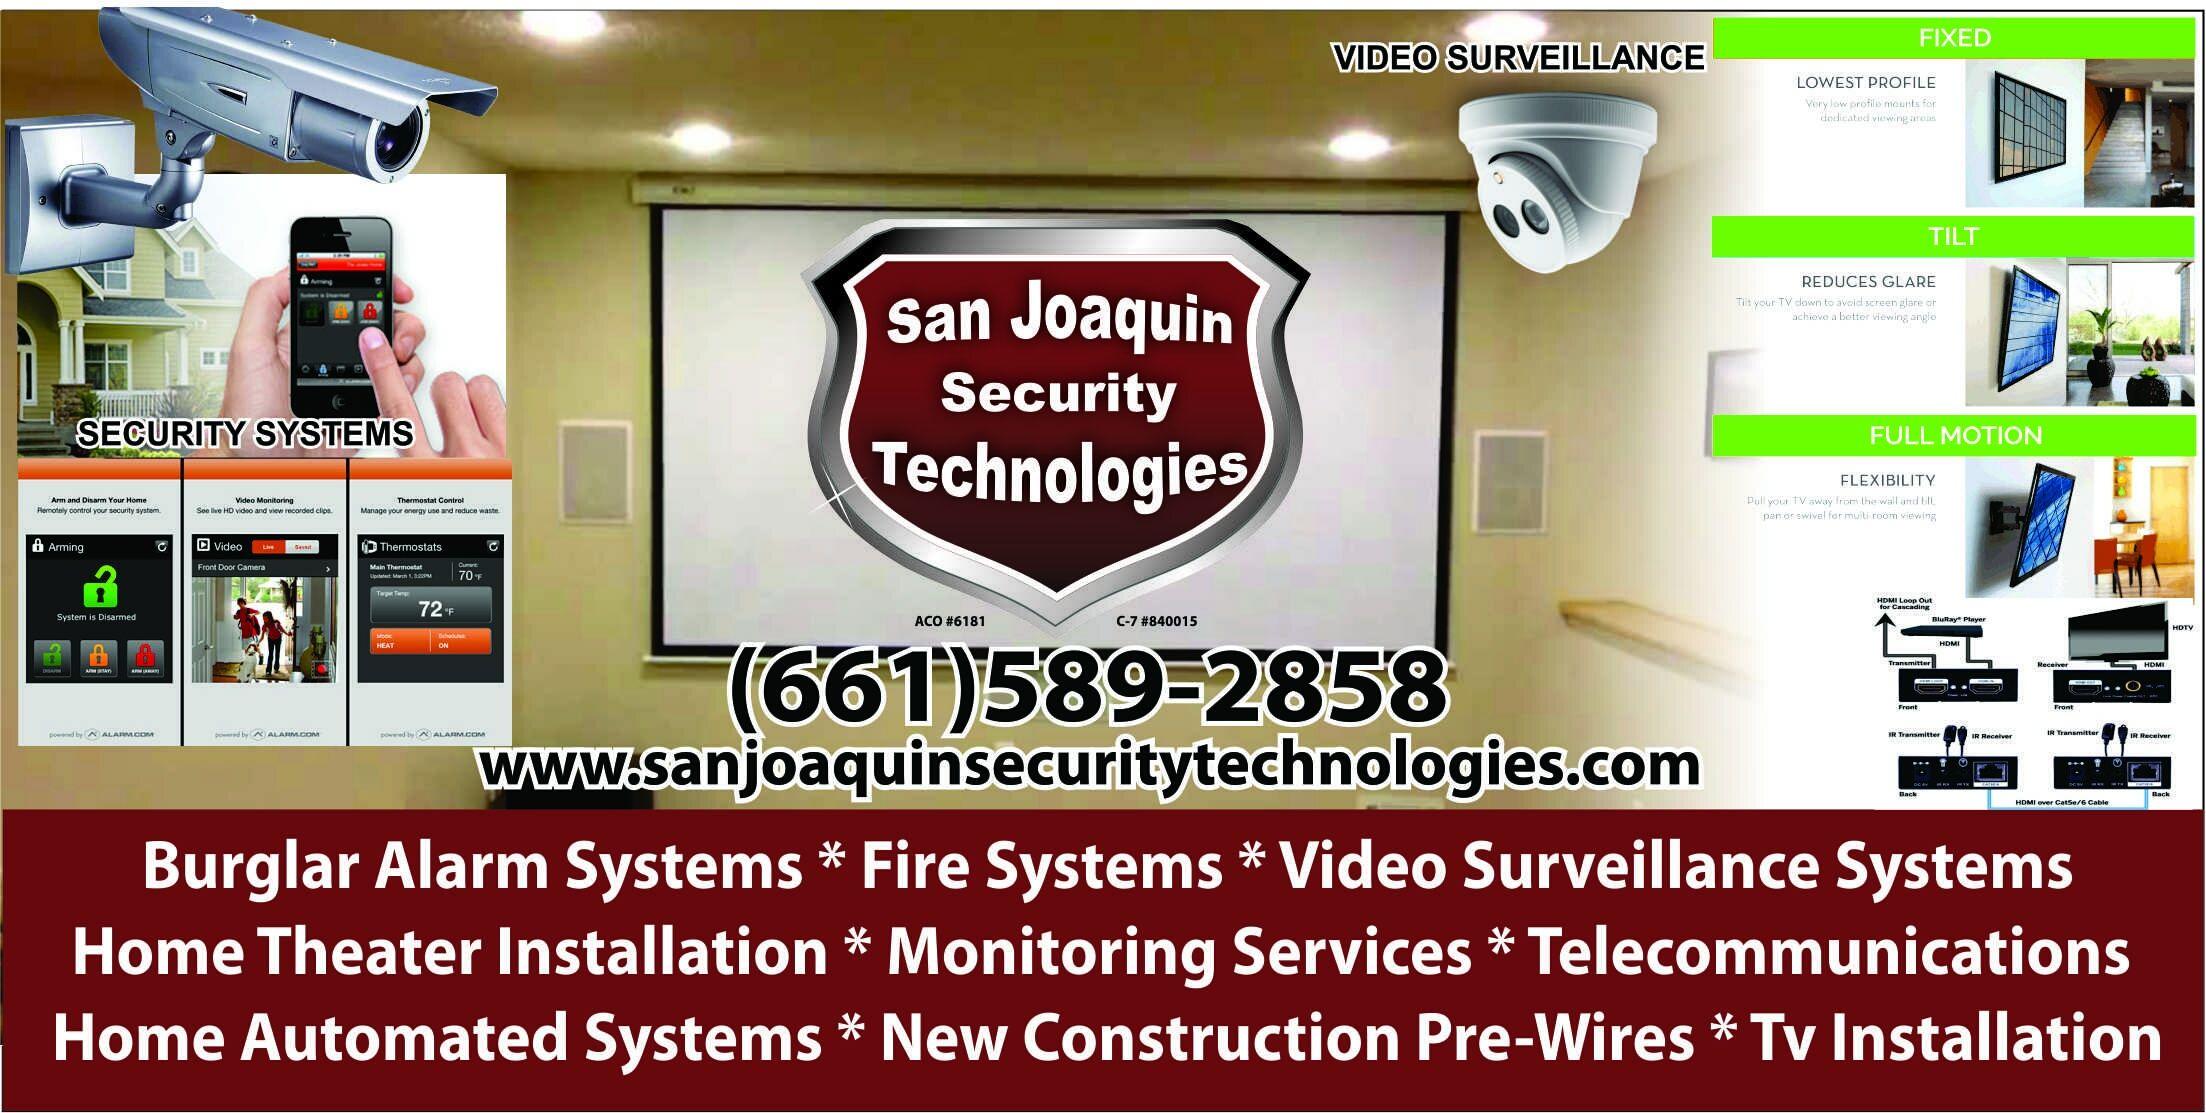 Shafter Ca Video Surveillance San Joaquin Security Technologies New Construction Wiring Home Theater 812 Walker Street 93263 877 890 7836